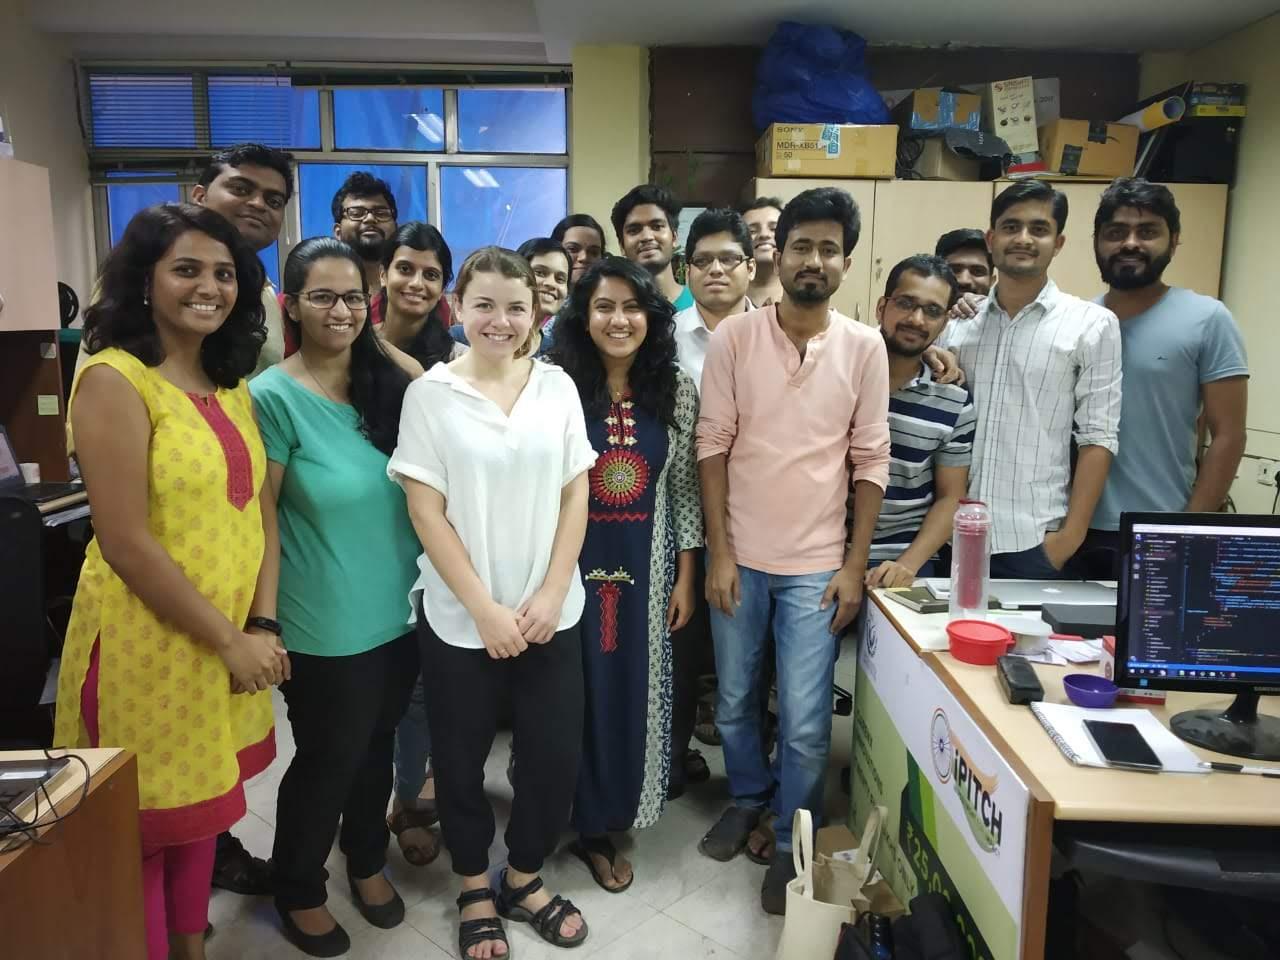 The CareNX Team at the HQ at IIT (Mumbai, India)